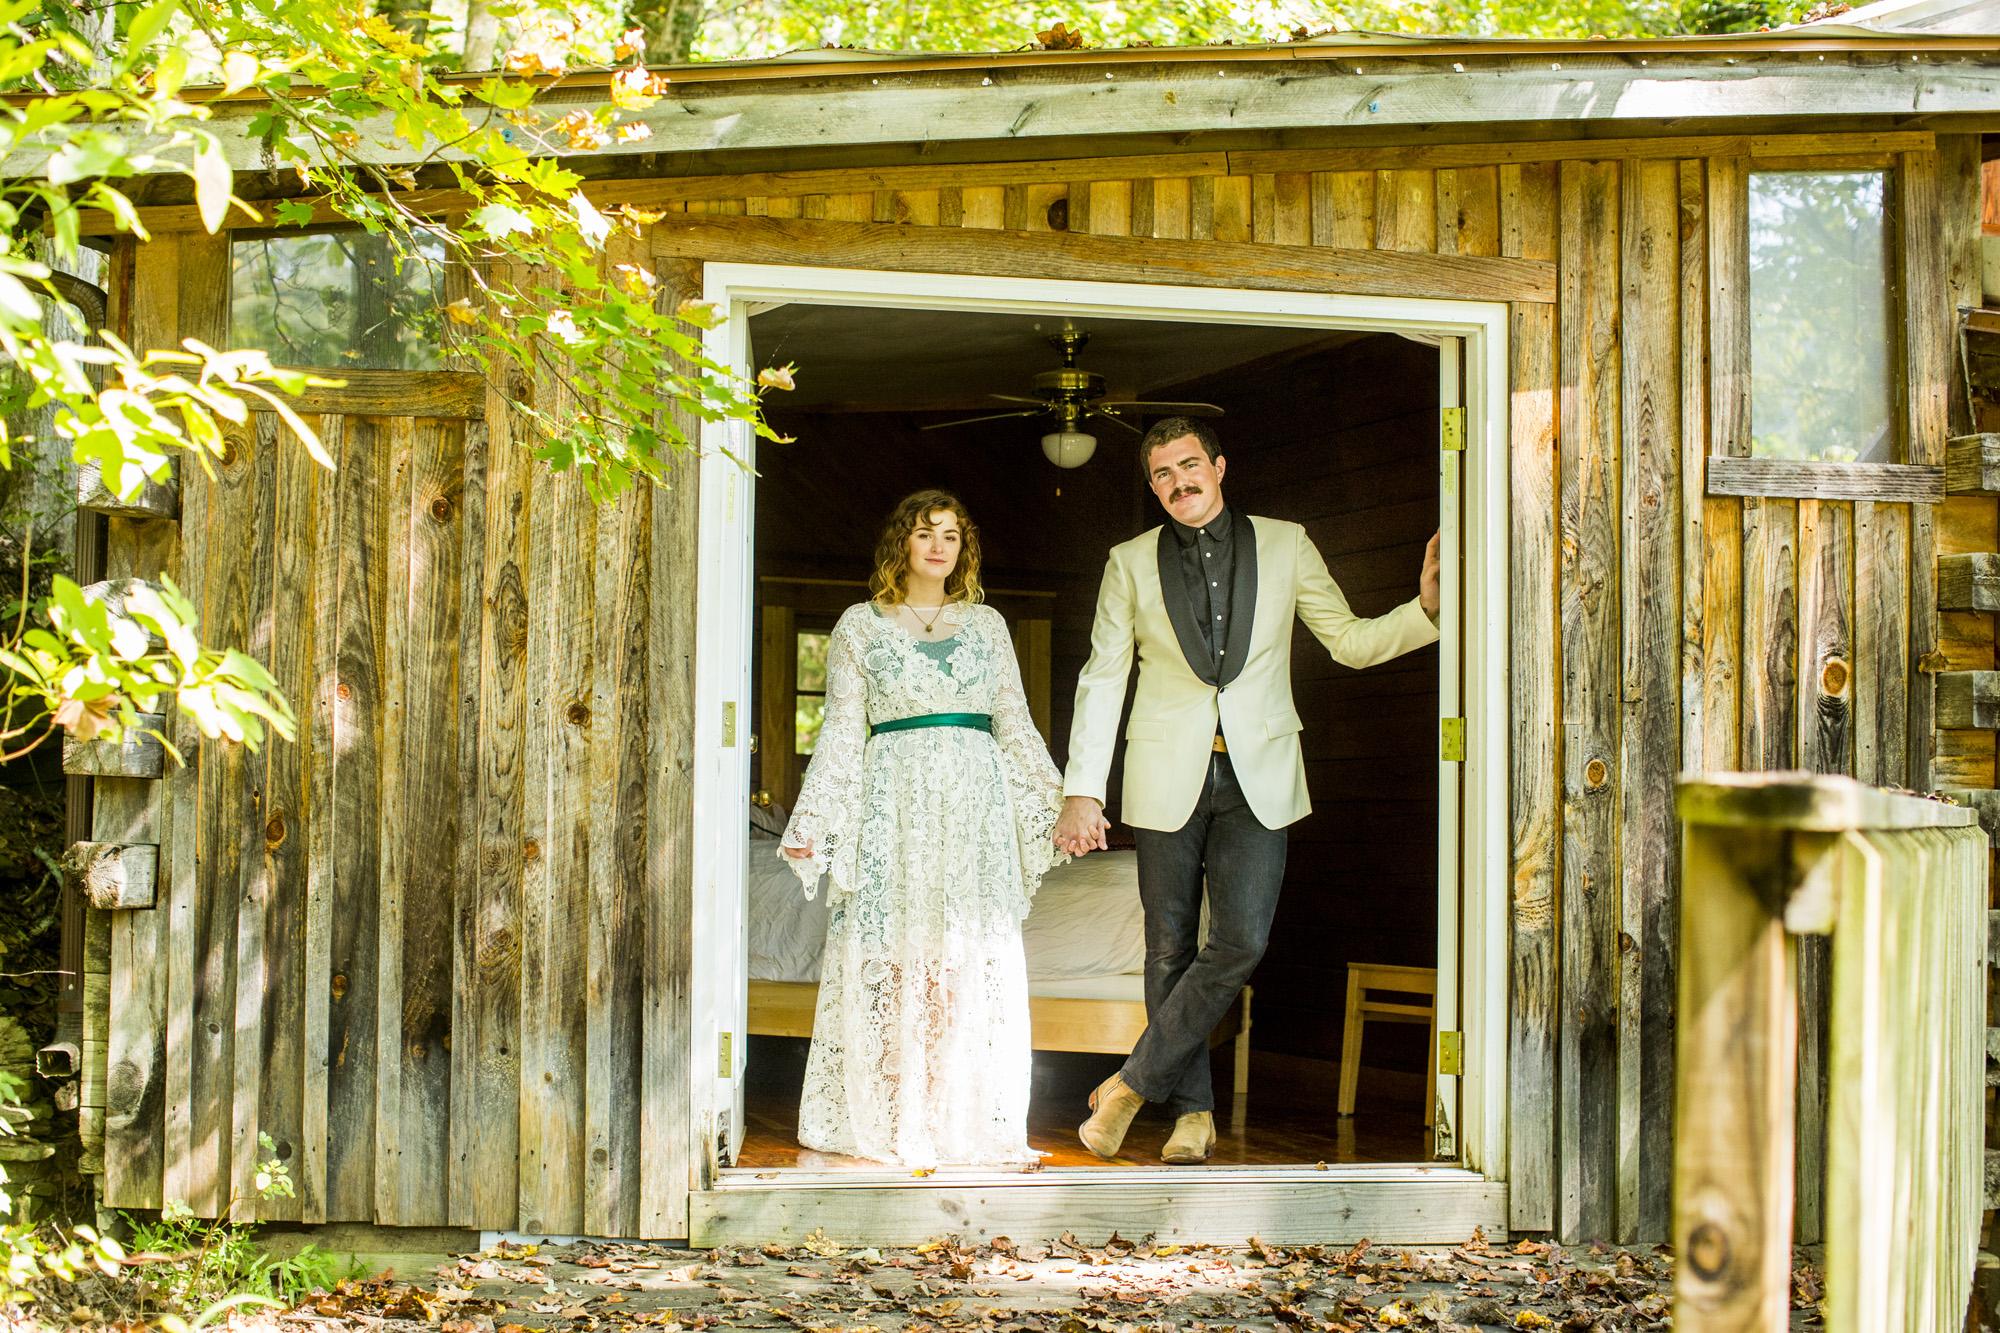 Seriously_Sabrina_Photography_Red_River_Gorge_Kentucky_Wedding_ShawnDana54.jpg